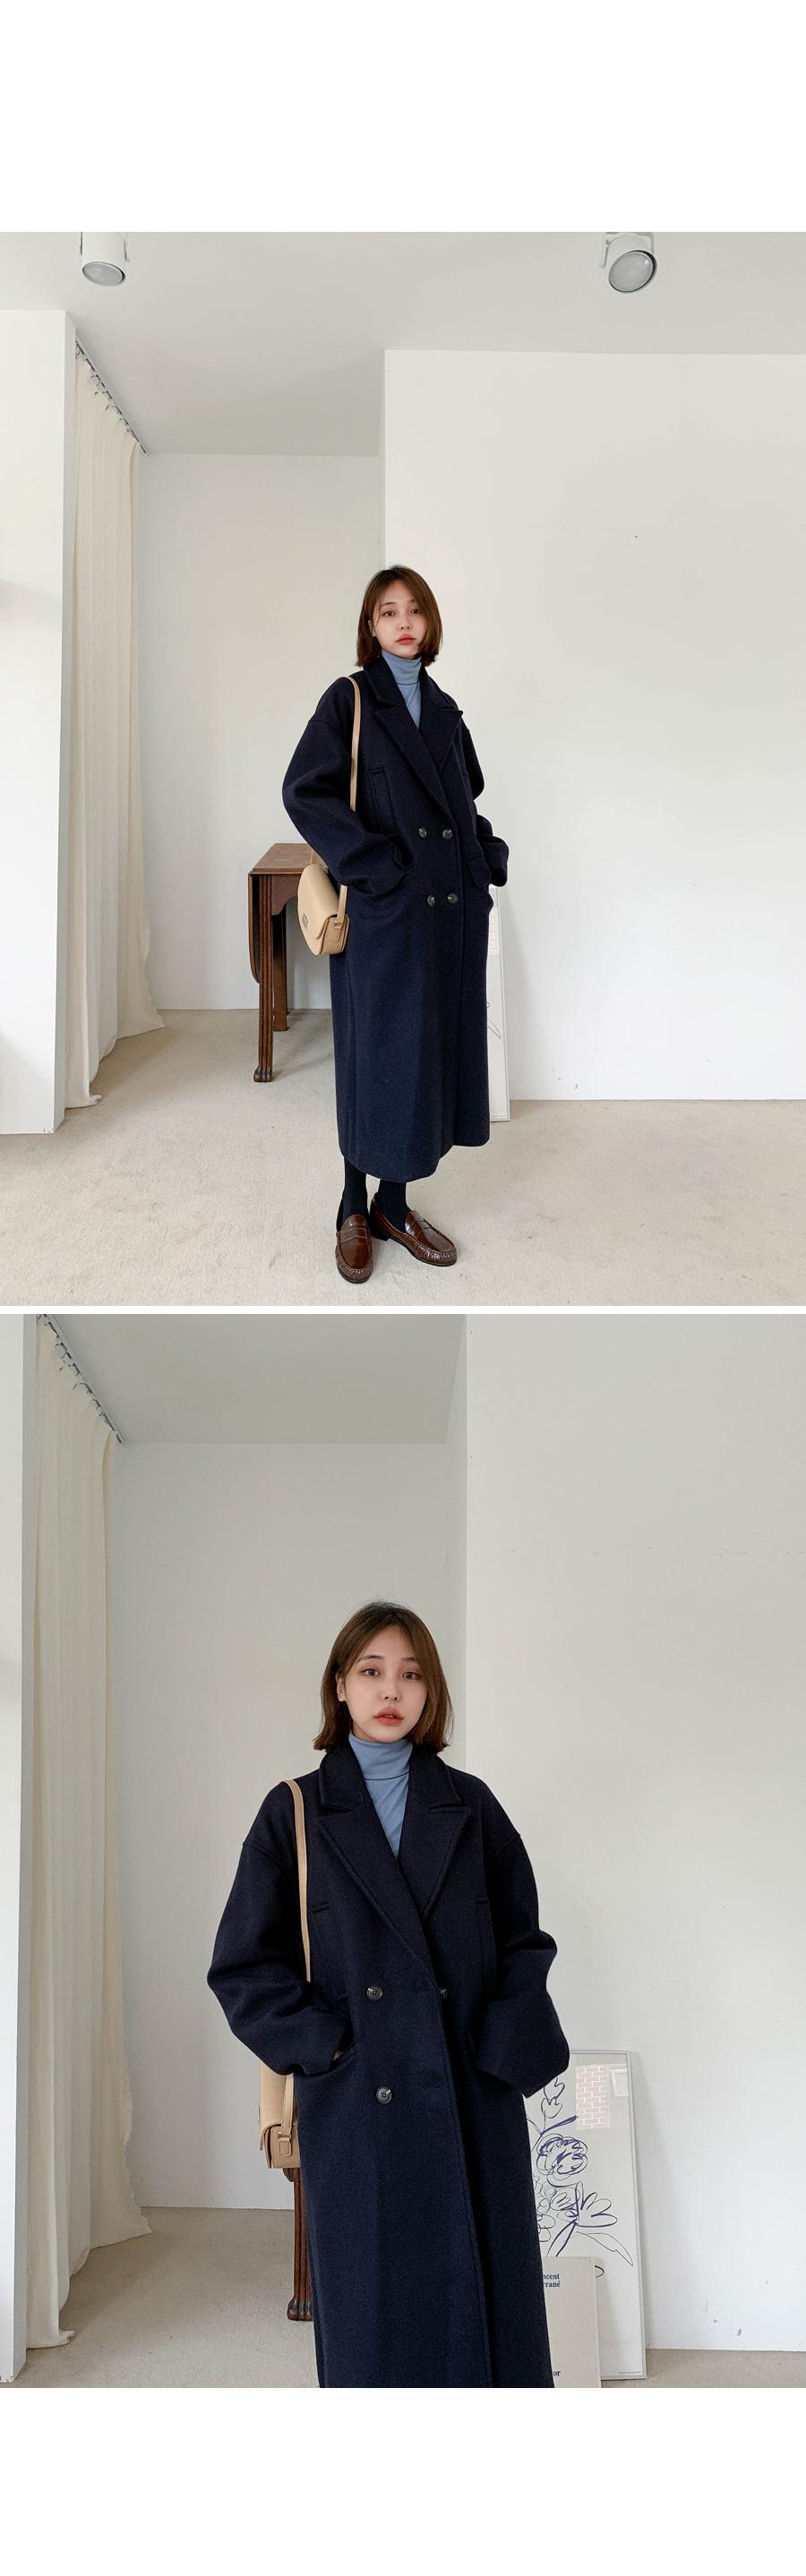 Wool Overfit Double Coat